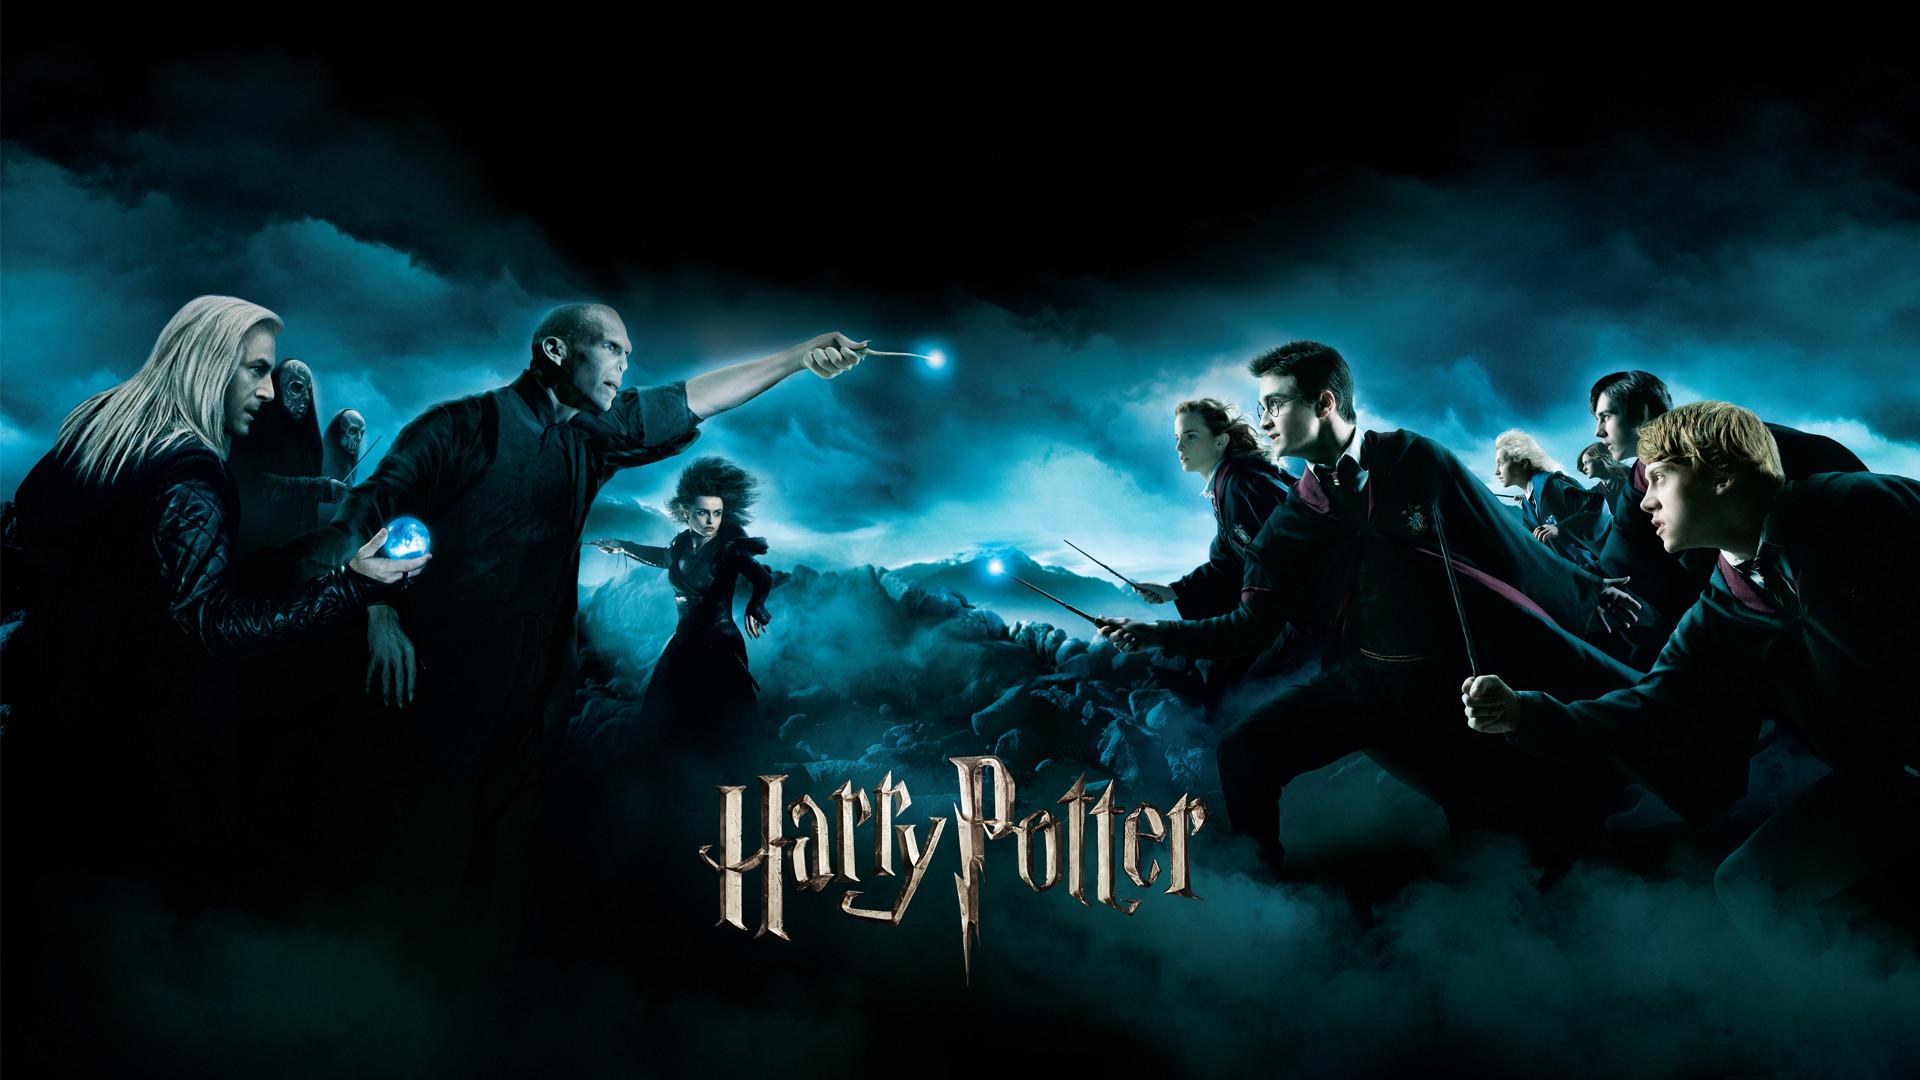 Harry Potter wallpaper (1) – hebus.org – High Definition .